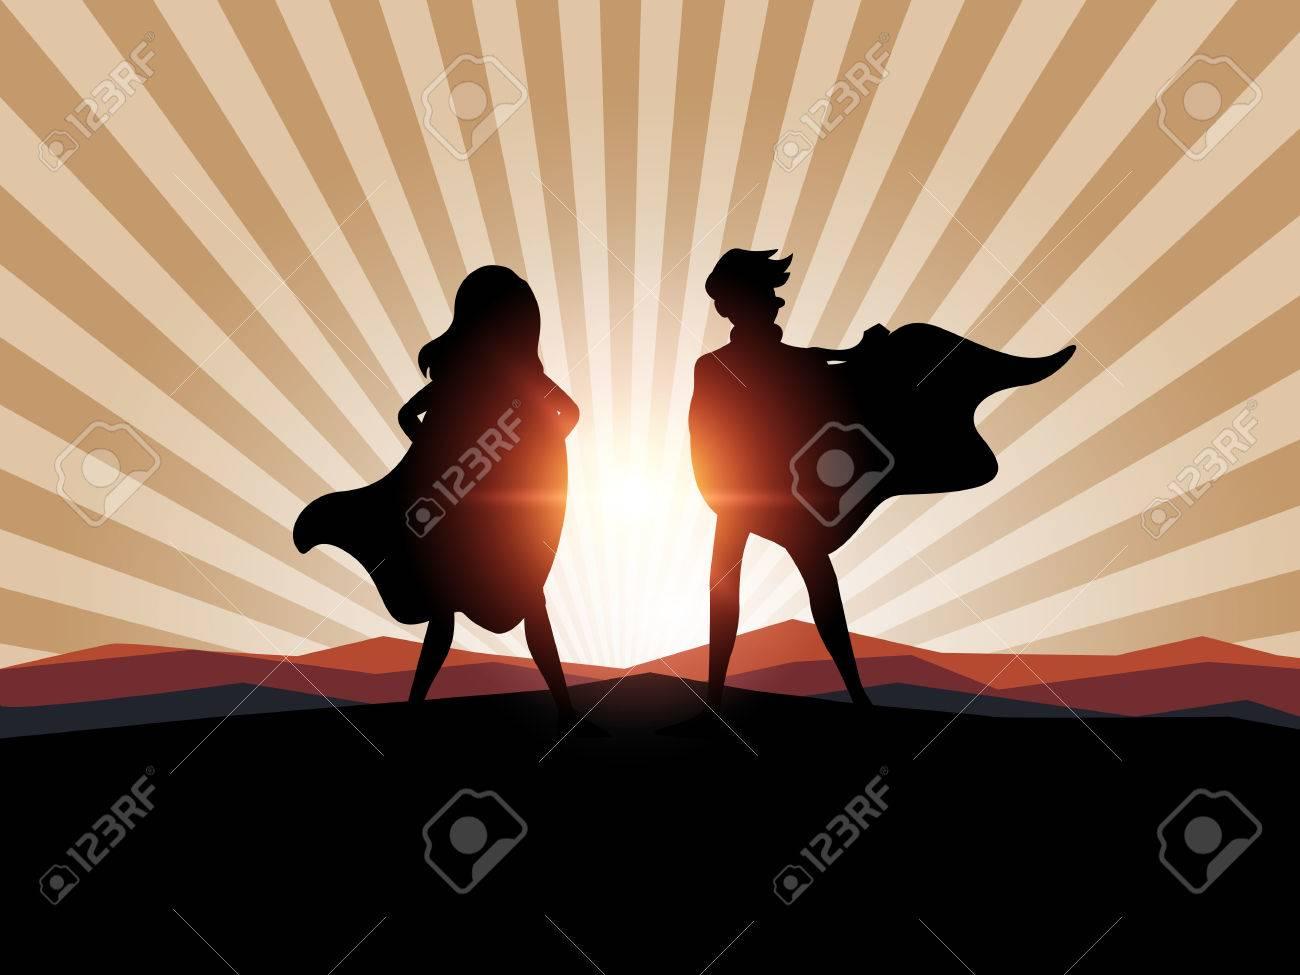 Silhouette man and women superhero with sunlight. - 69260080